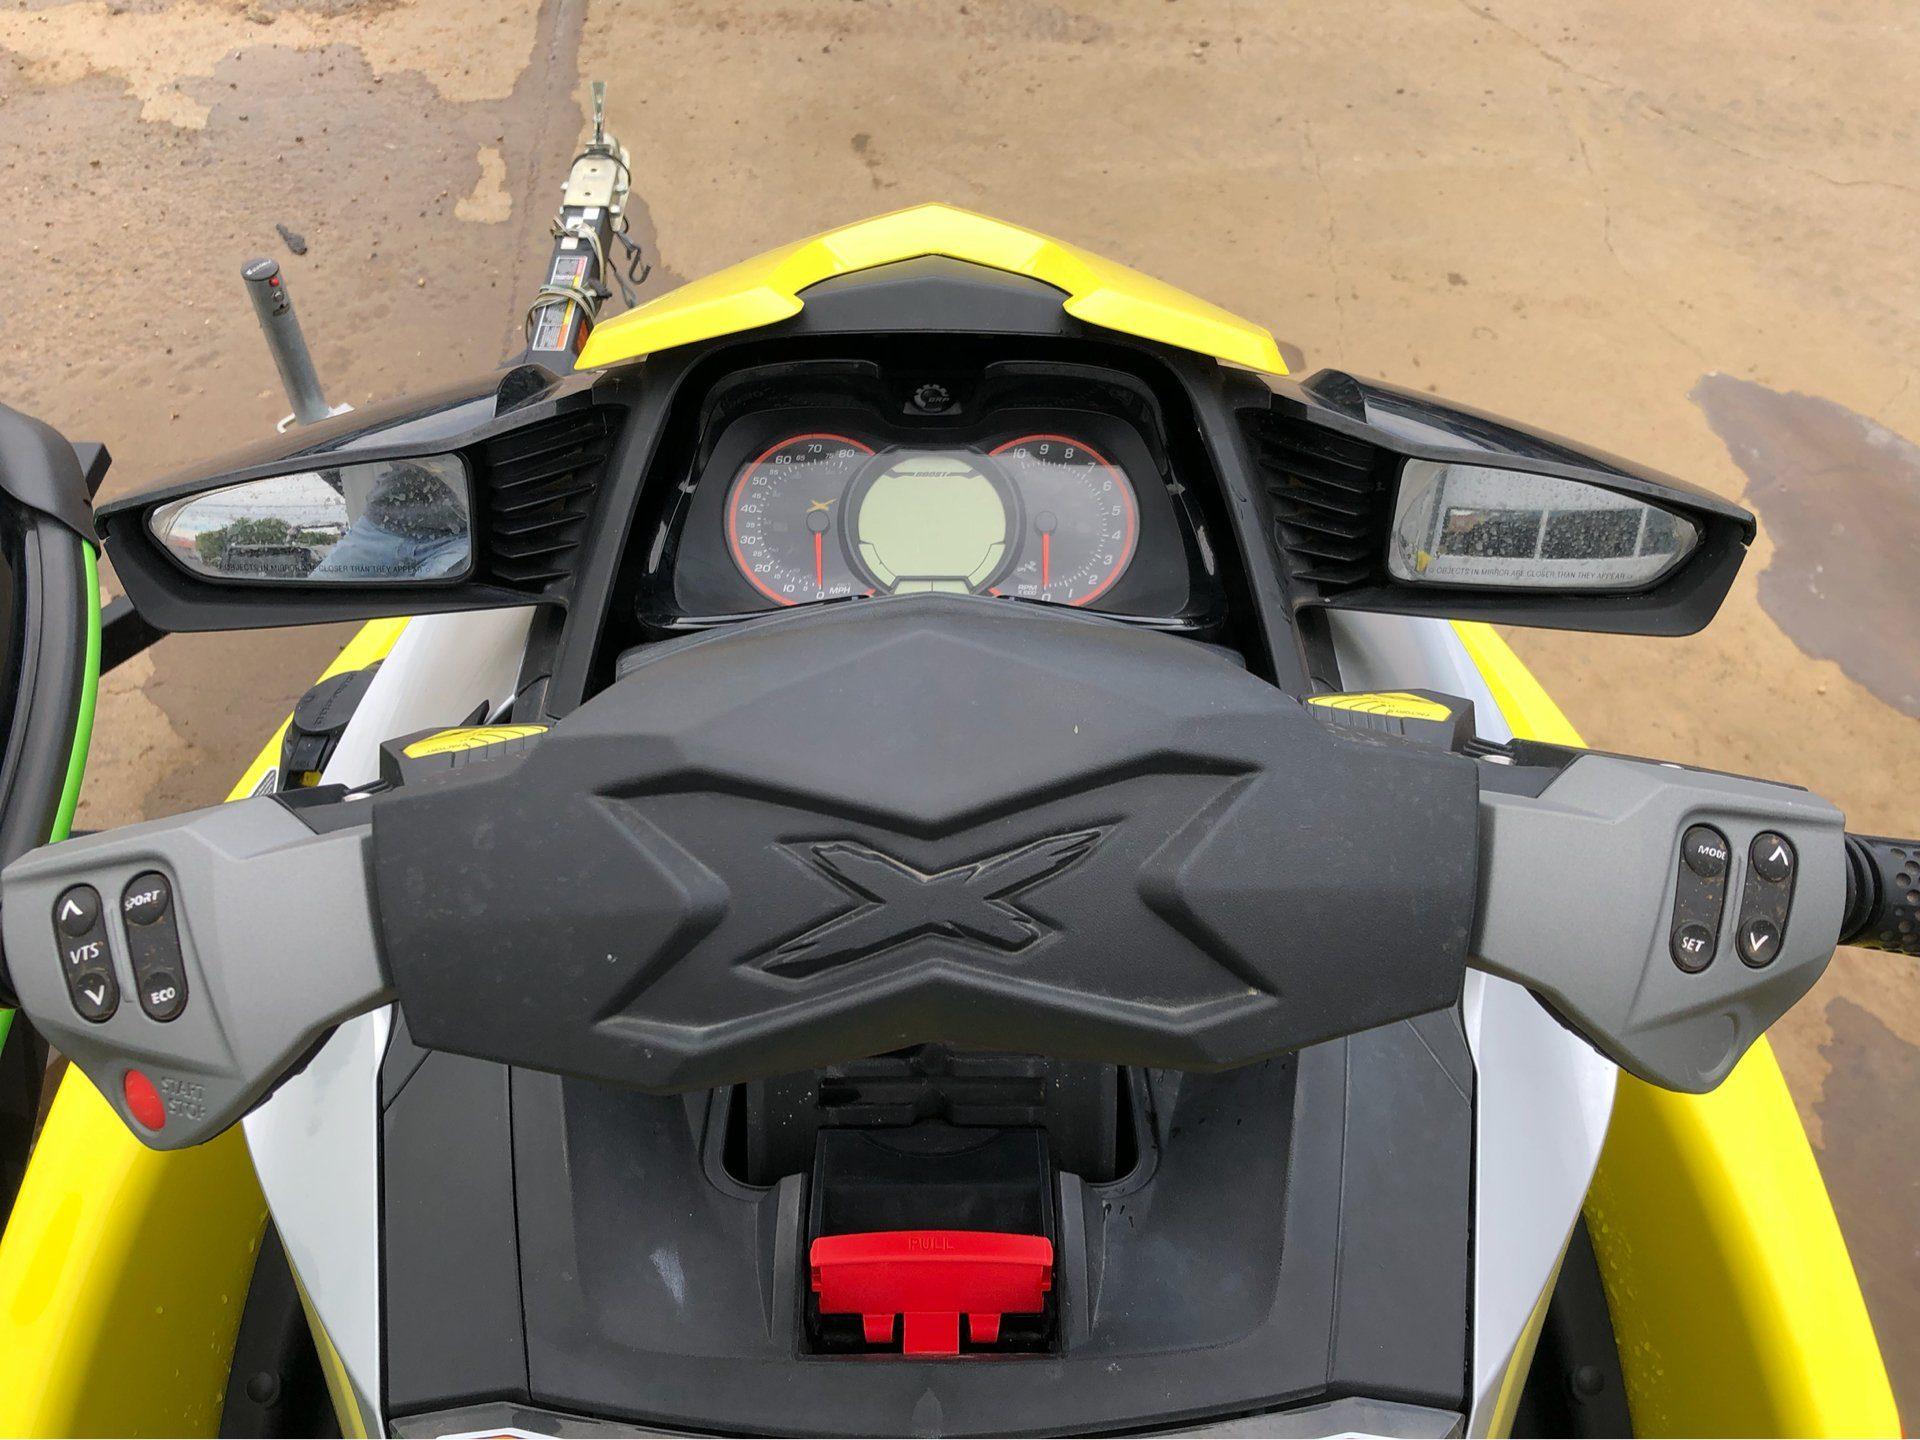 2015 Sea-Doo RXT®-X® 260 in Amarillo, Texas